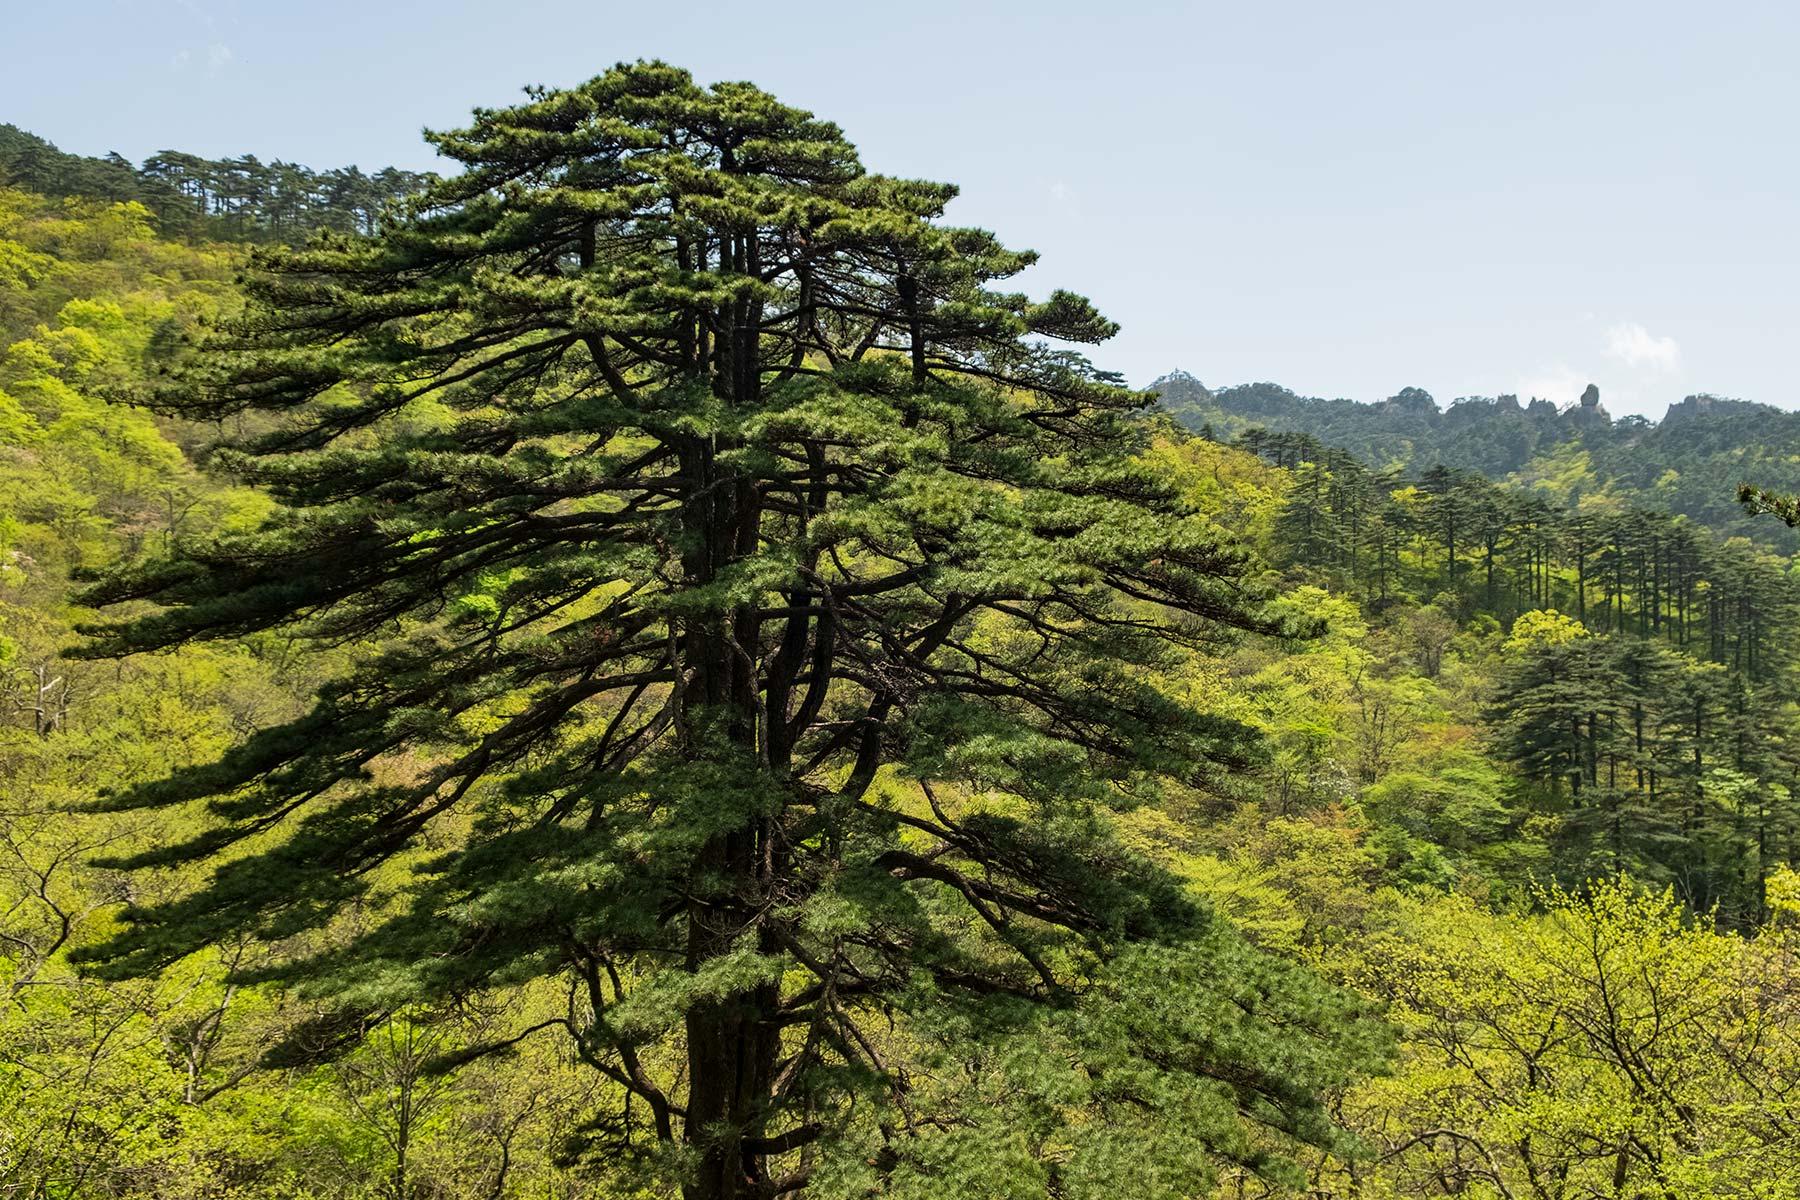 Unity Pine Kiefer im Huangshan Gebirge in Anhui, China im Frühling